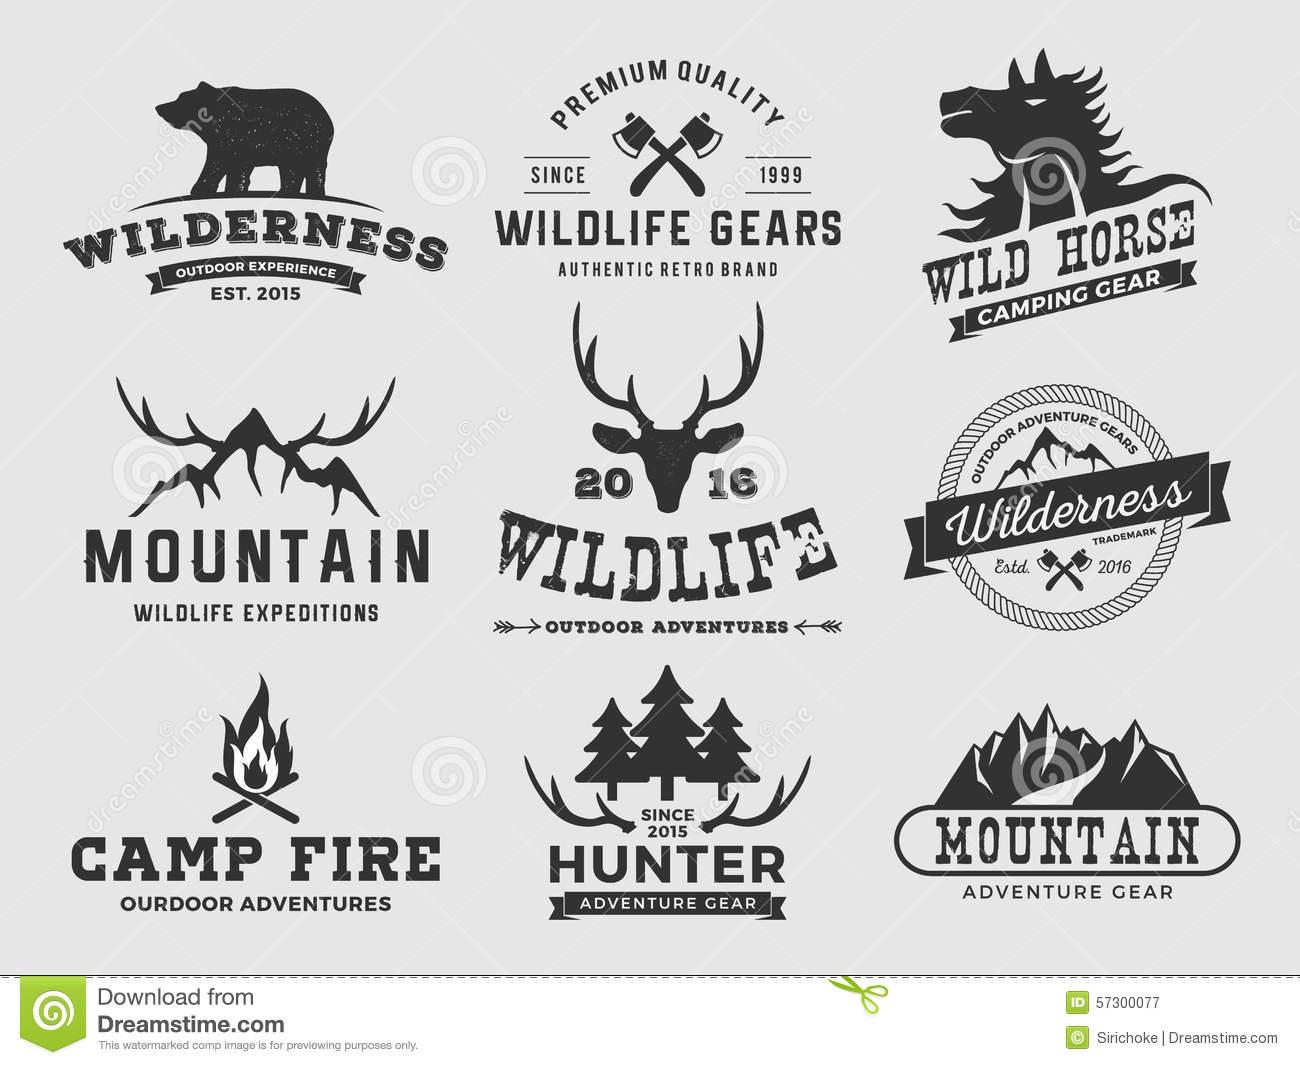 Campfire clipart outdoor adventure Mountain – Download Wilderness Clip